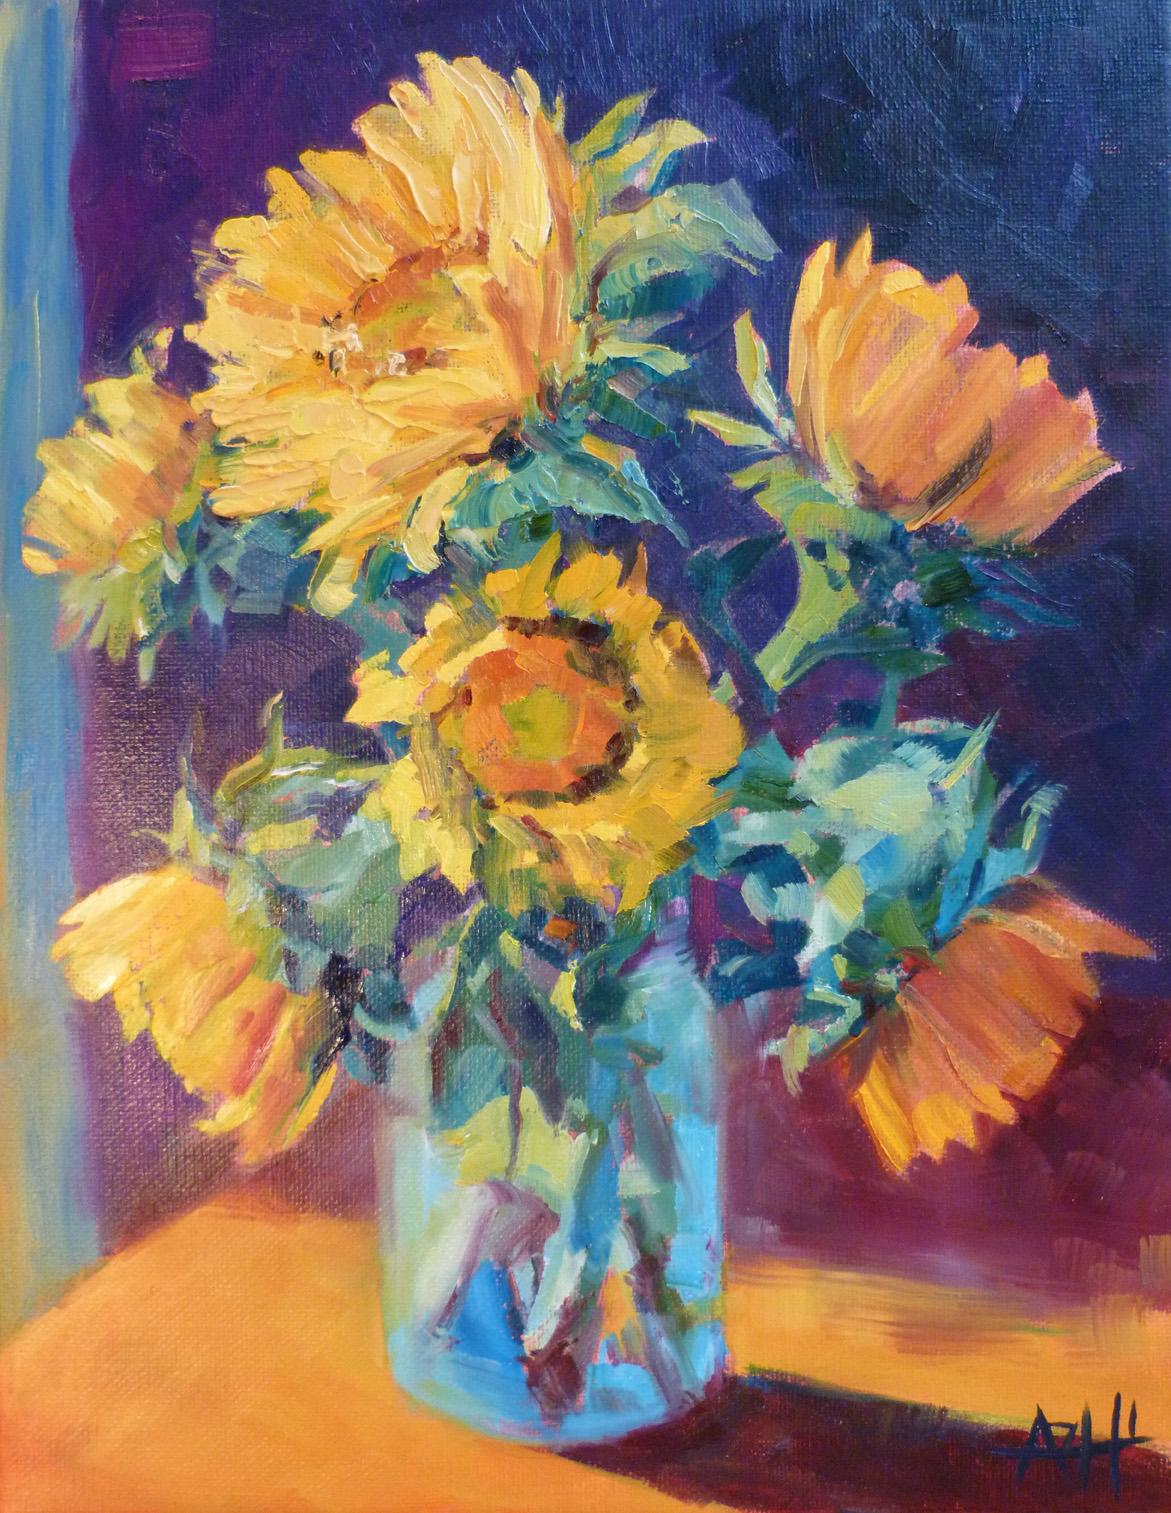 "SOLD, Sunflowers in the Light, Copyright 2014 Hirschten, Oil on Canvas 11"" x 14"""